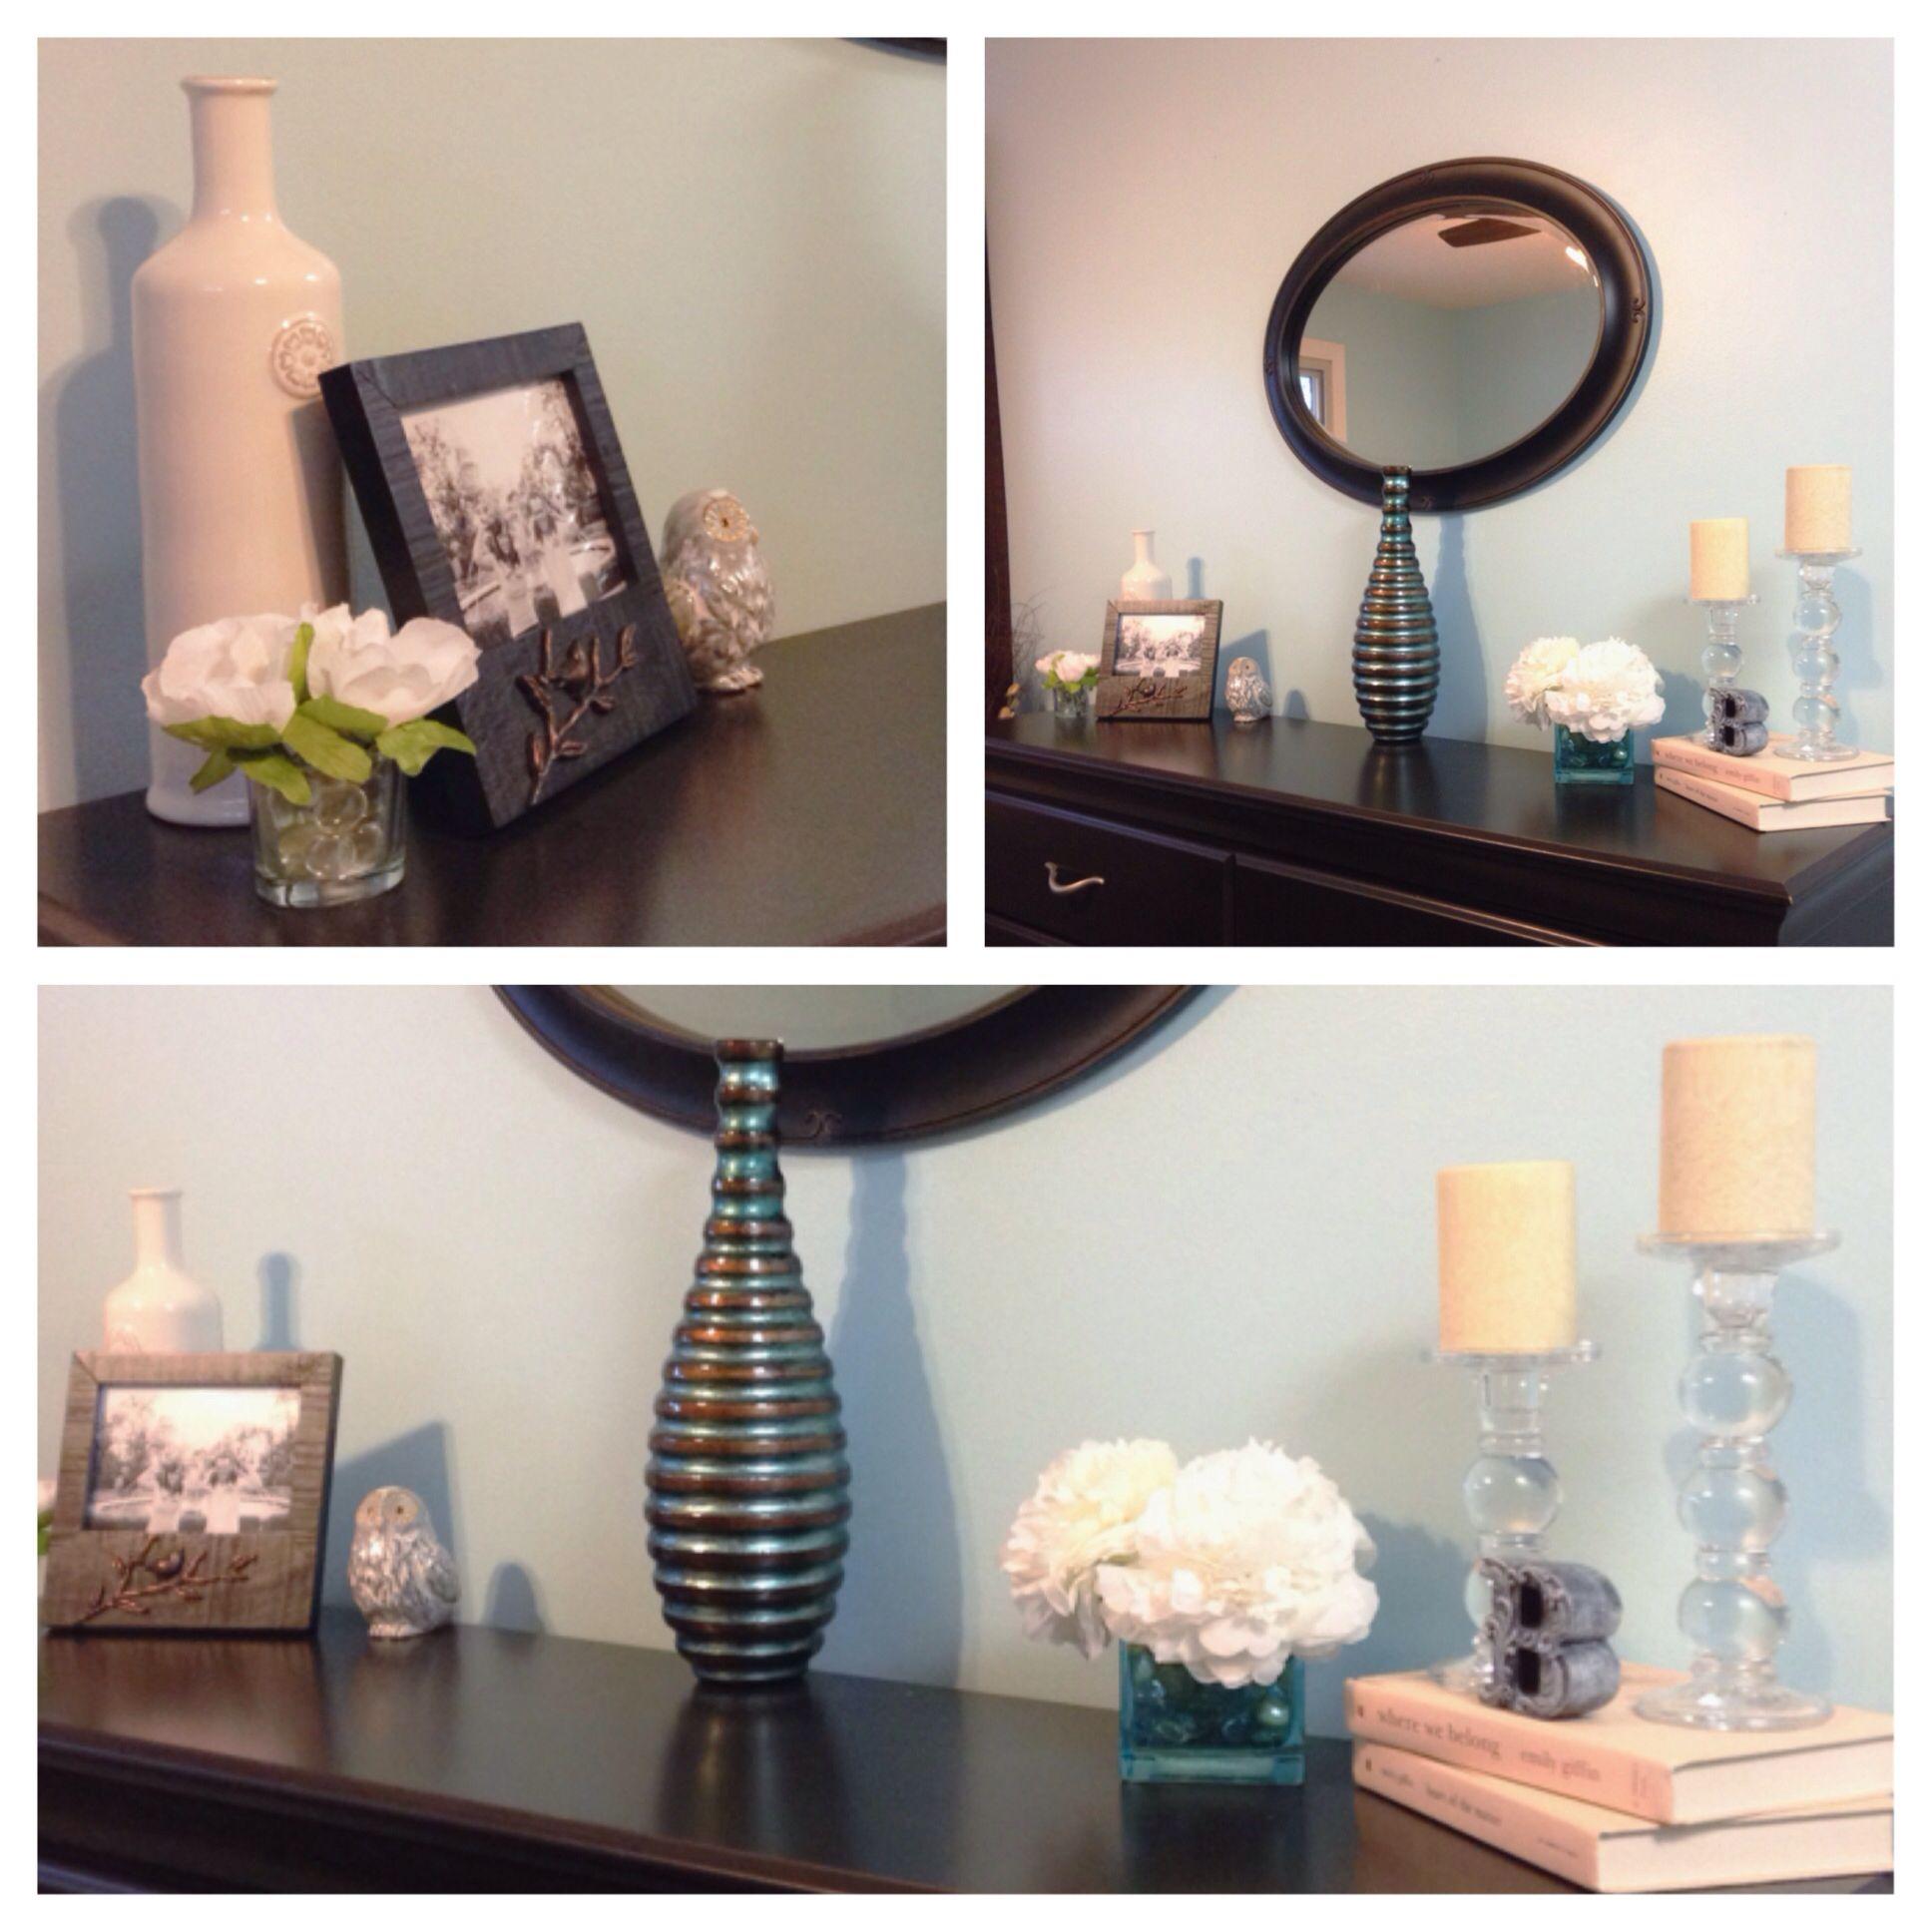 Dresser decorating ideas - glass, flowers, porcelain & a splash of ...